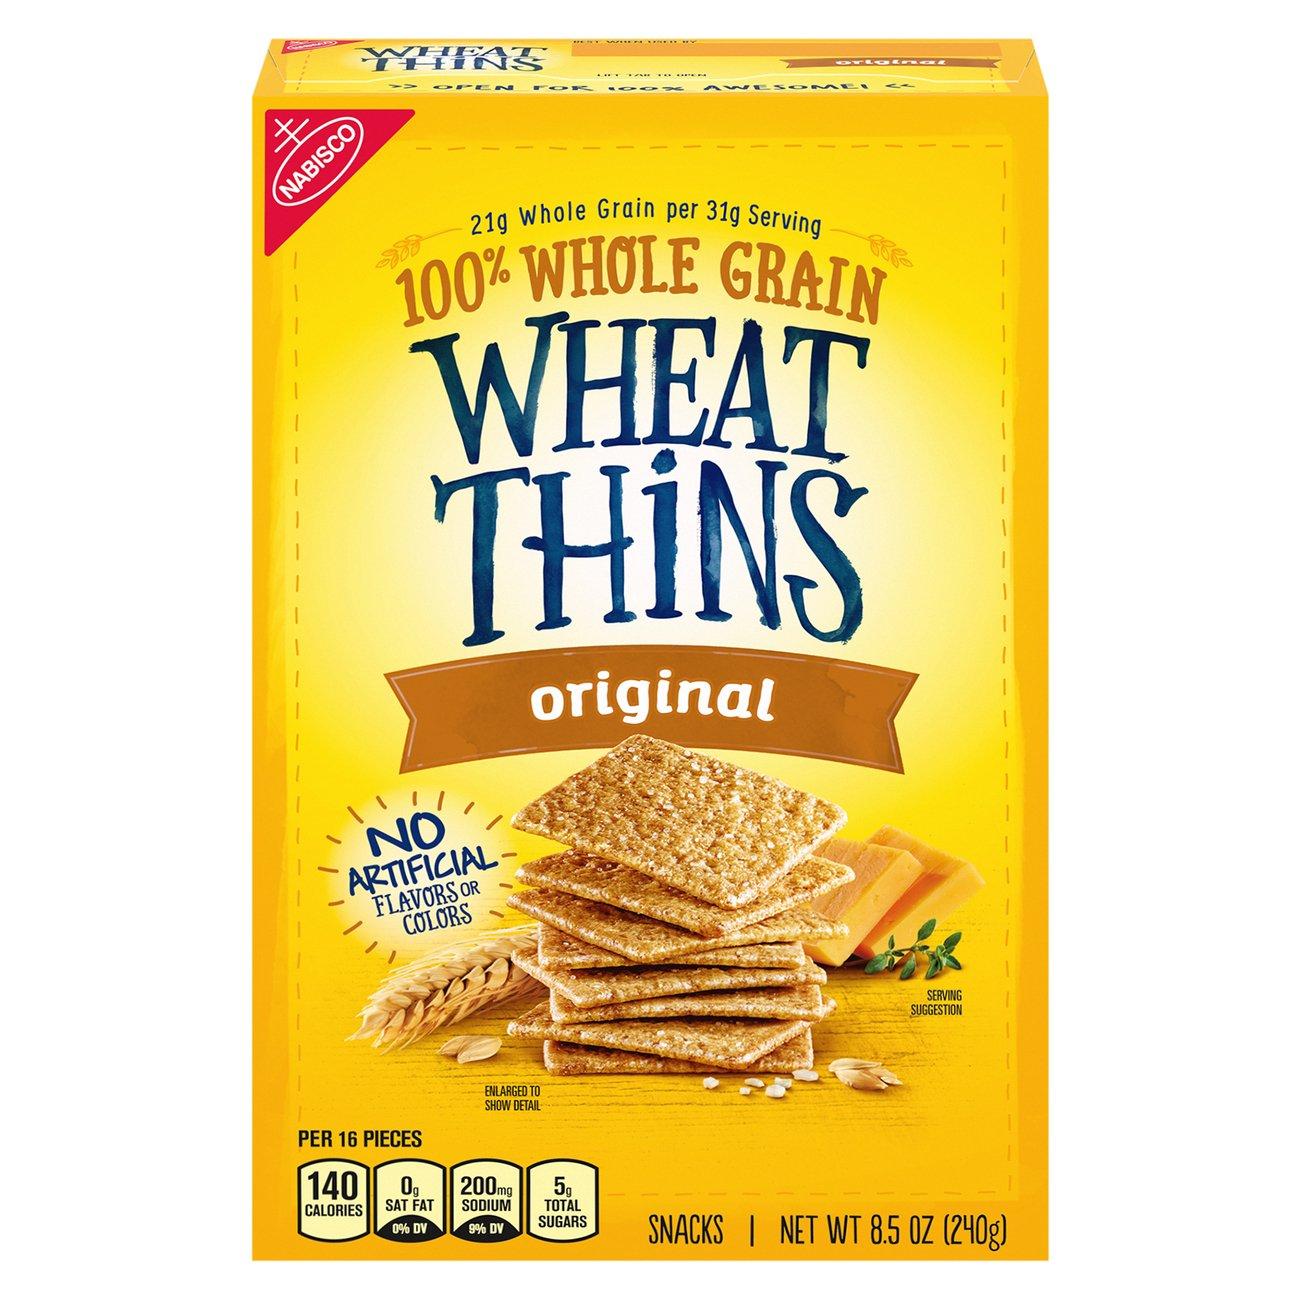 Nabisco Wheat Thins Original Crackers Shop Crackers Breadsticks At H E B